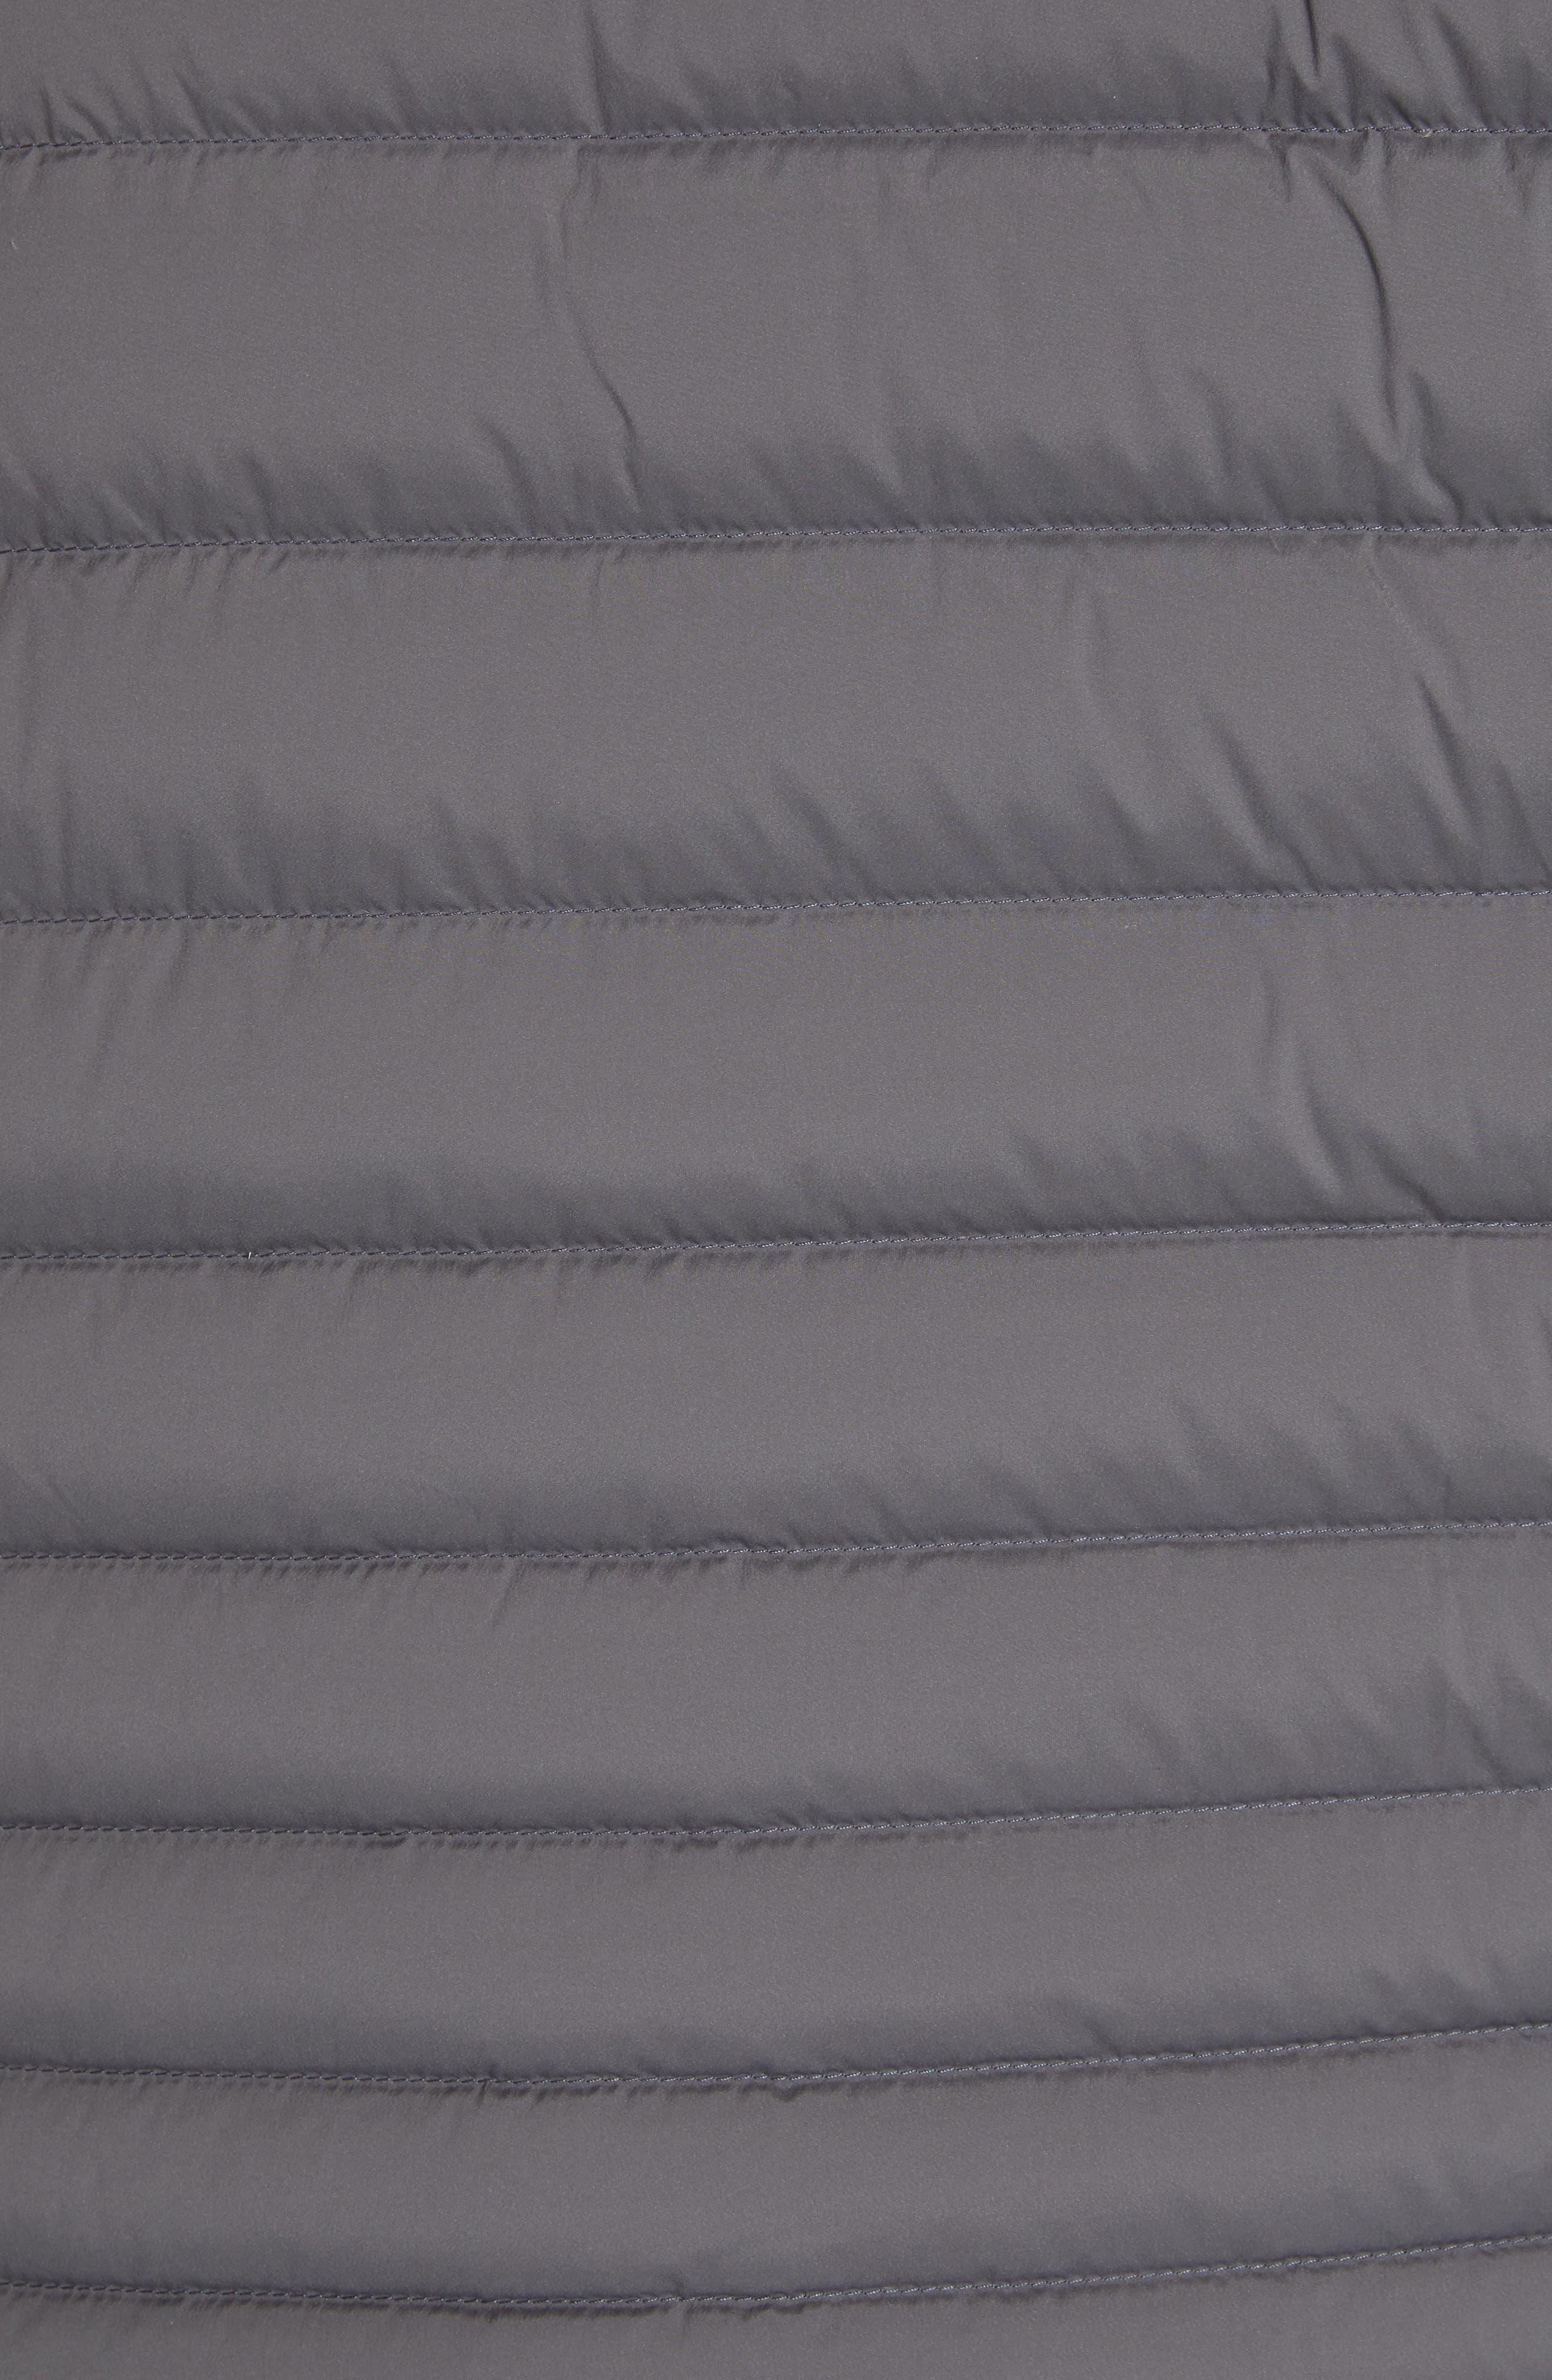 Blackcomb Stretch Hooded Men's Down Fill Jacket,                             Alternate thumbnail 7, color,                             STEEL GREY